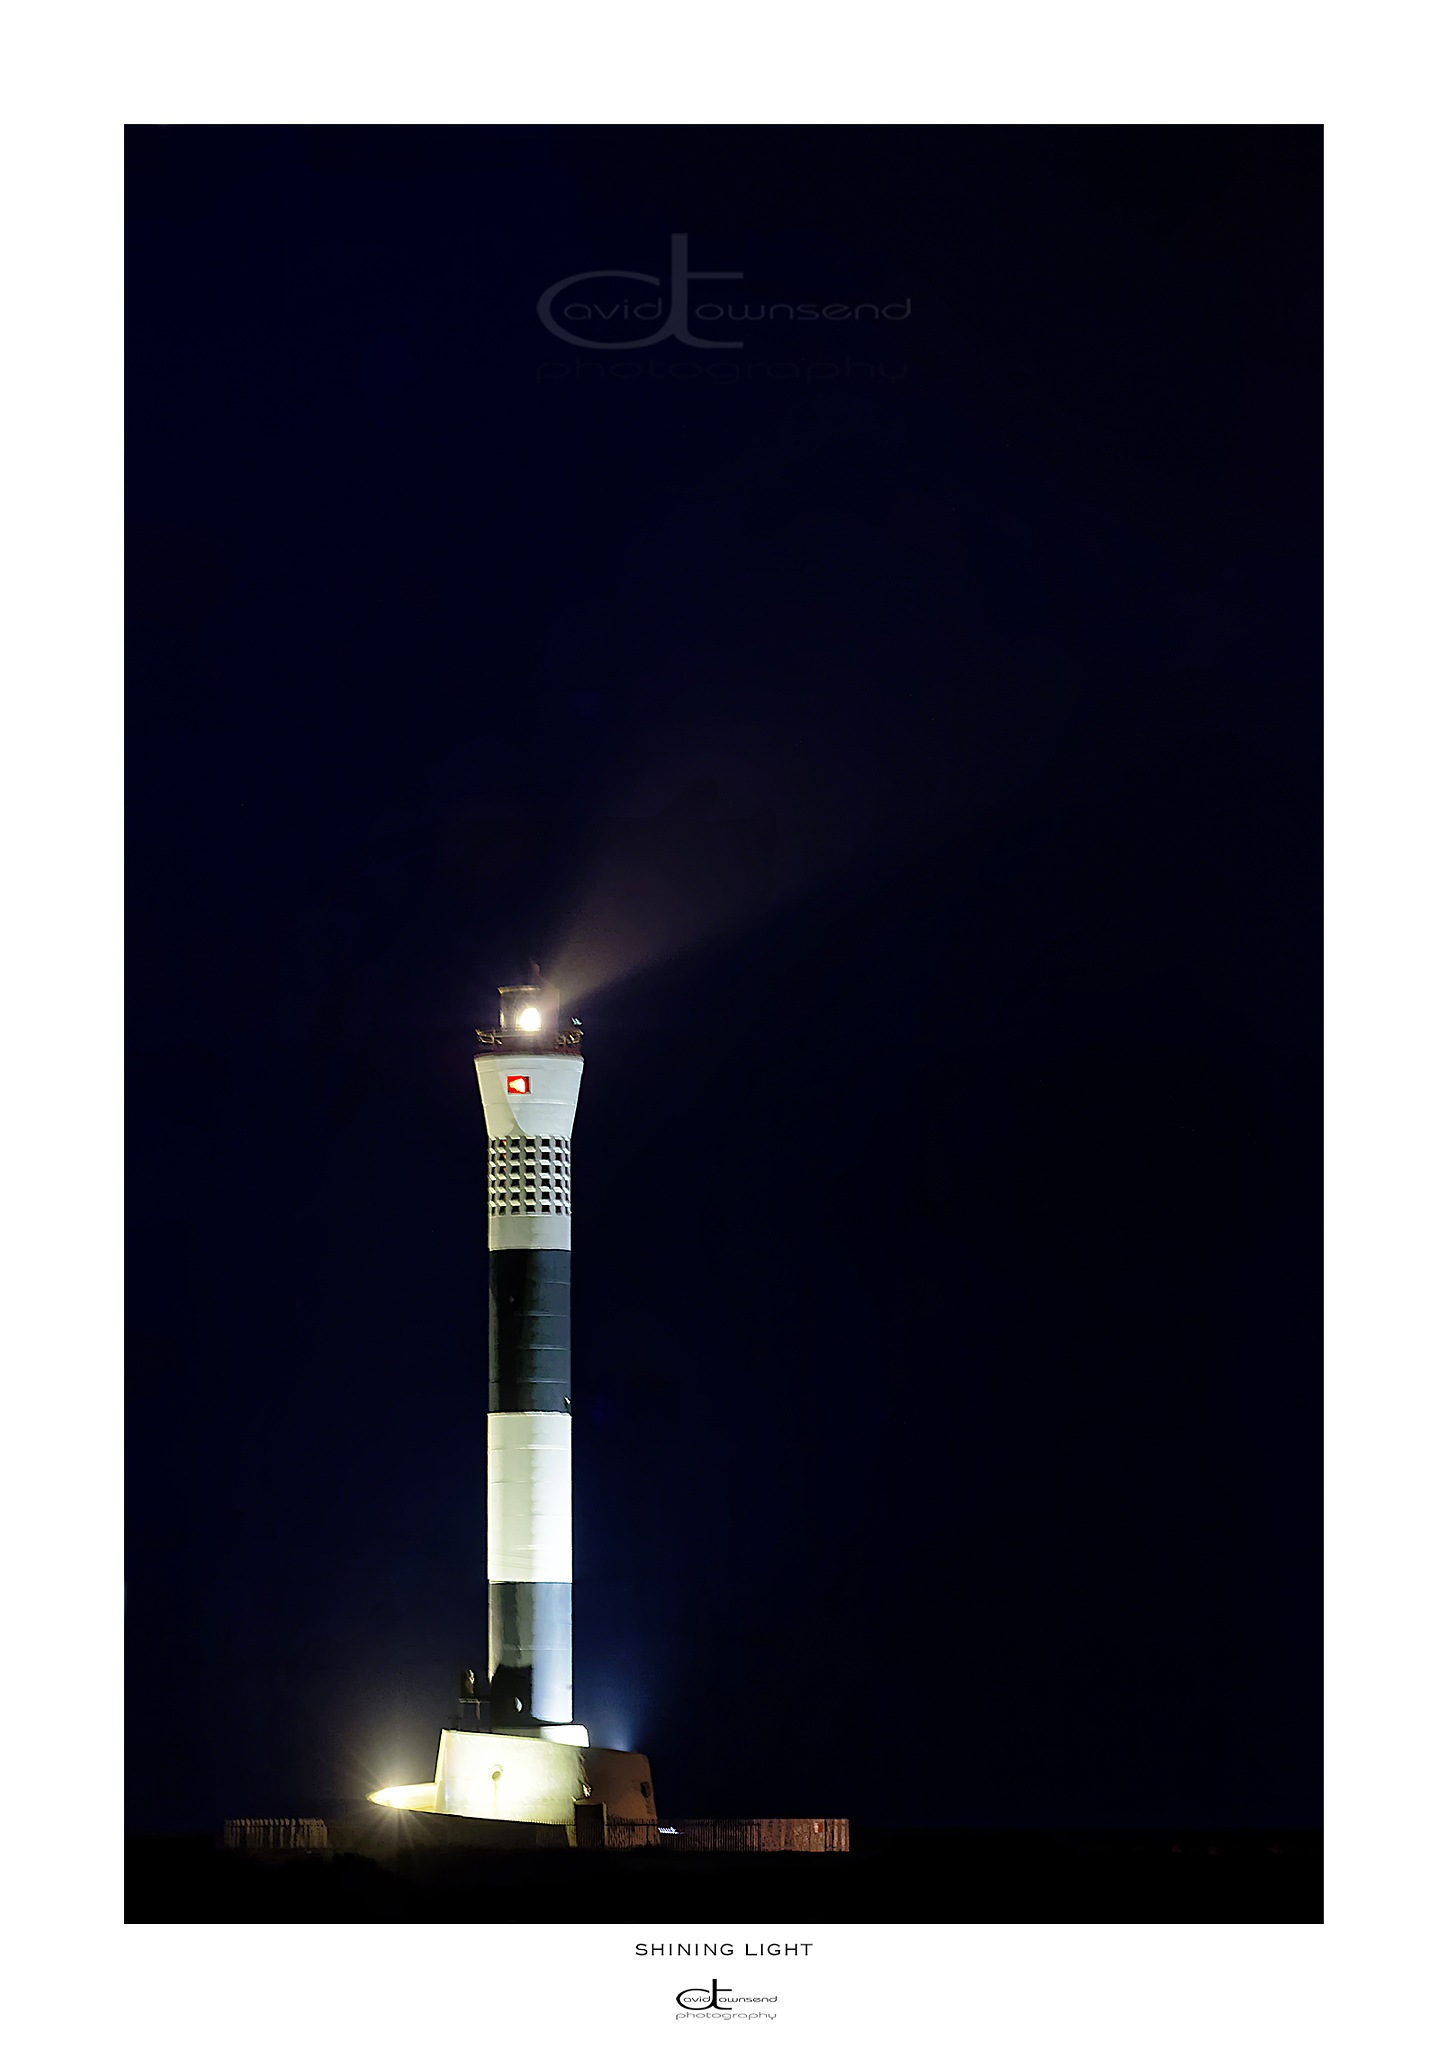 Shining light  by David Townsend